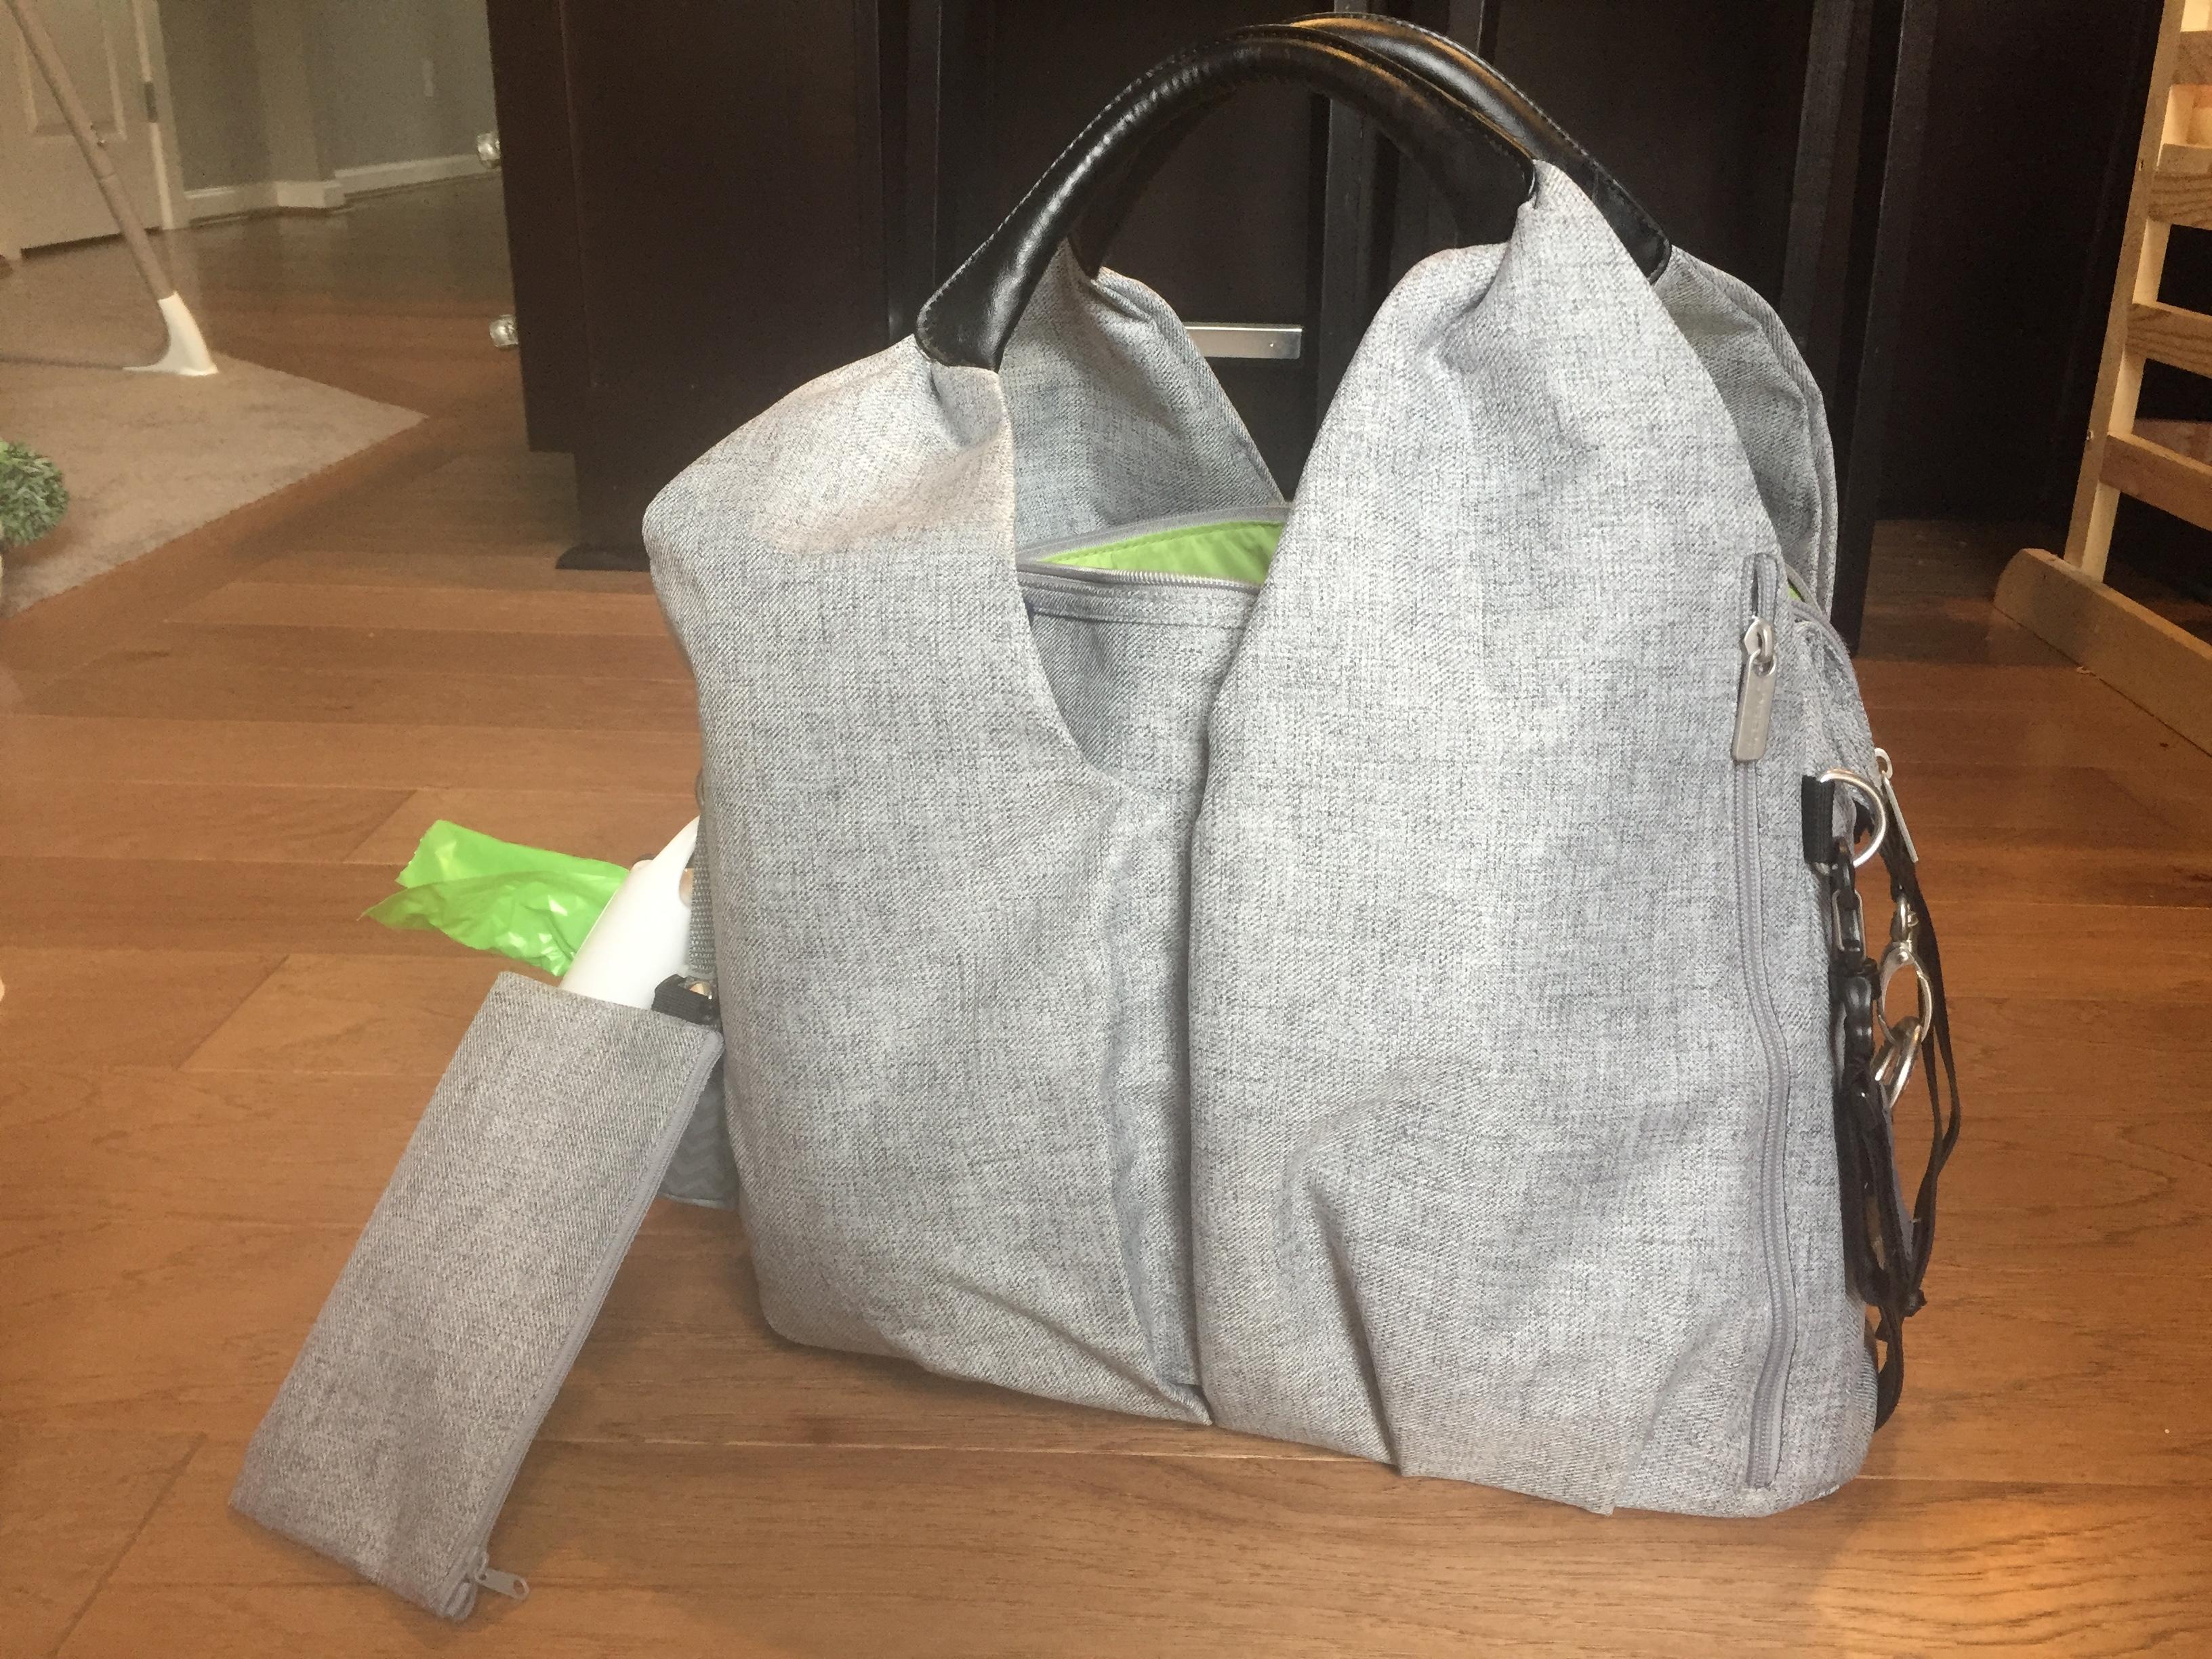 Lassig's Green Label Neckline Diaper Bag